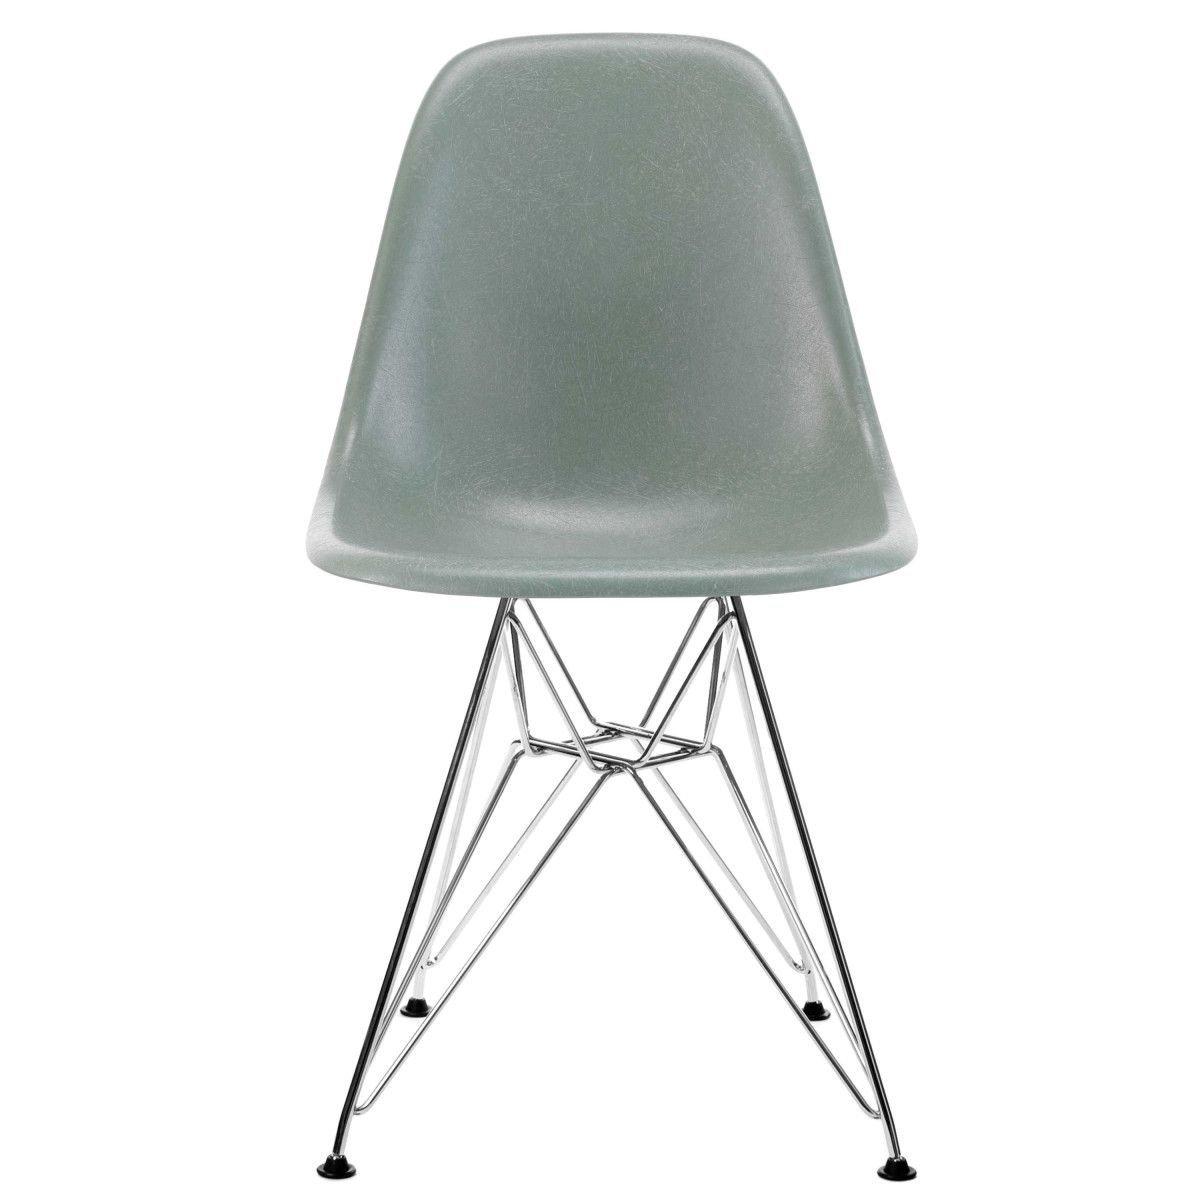 Vitra Eames Fiberglass Chair DSR - Sea Foam Green/Chroom